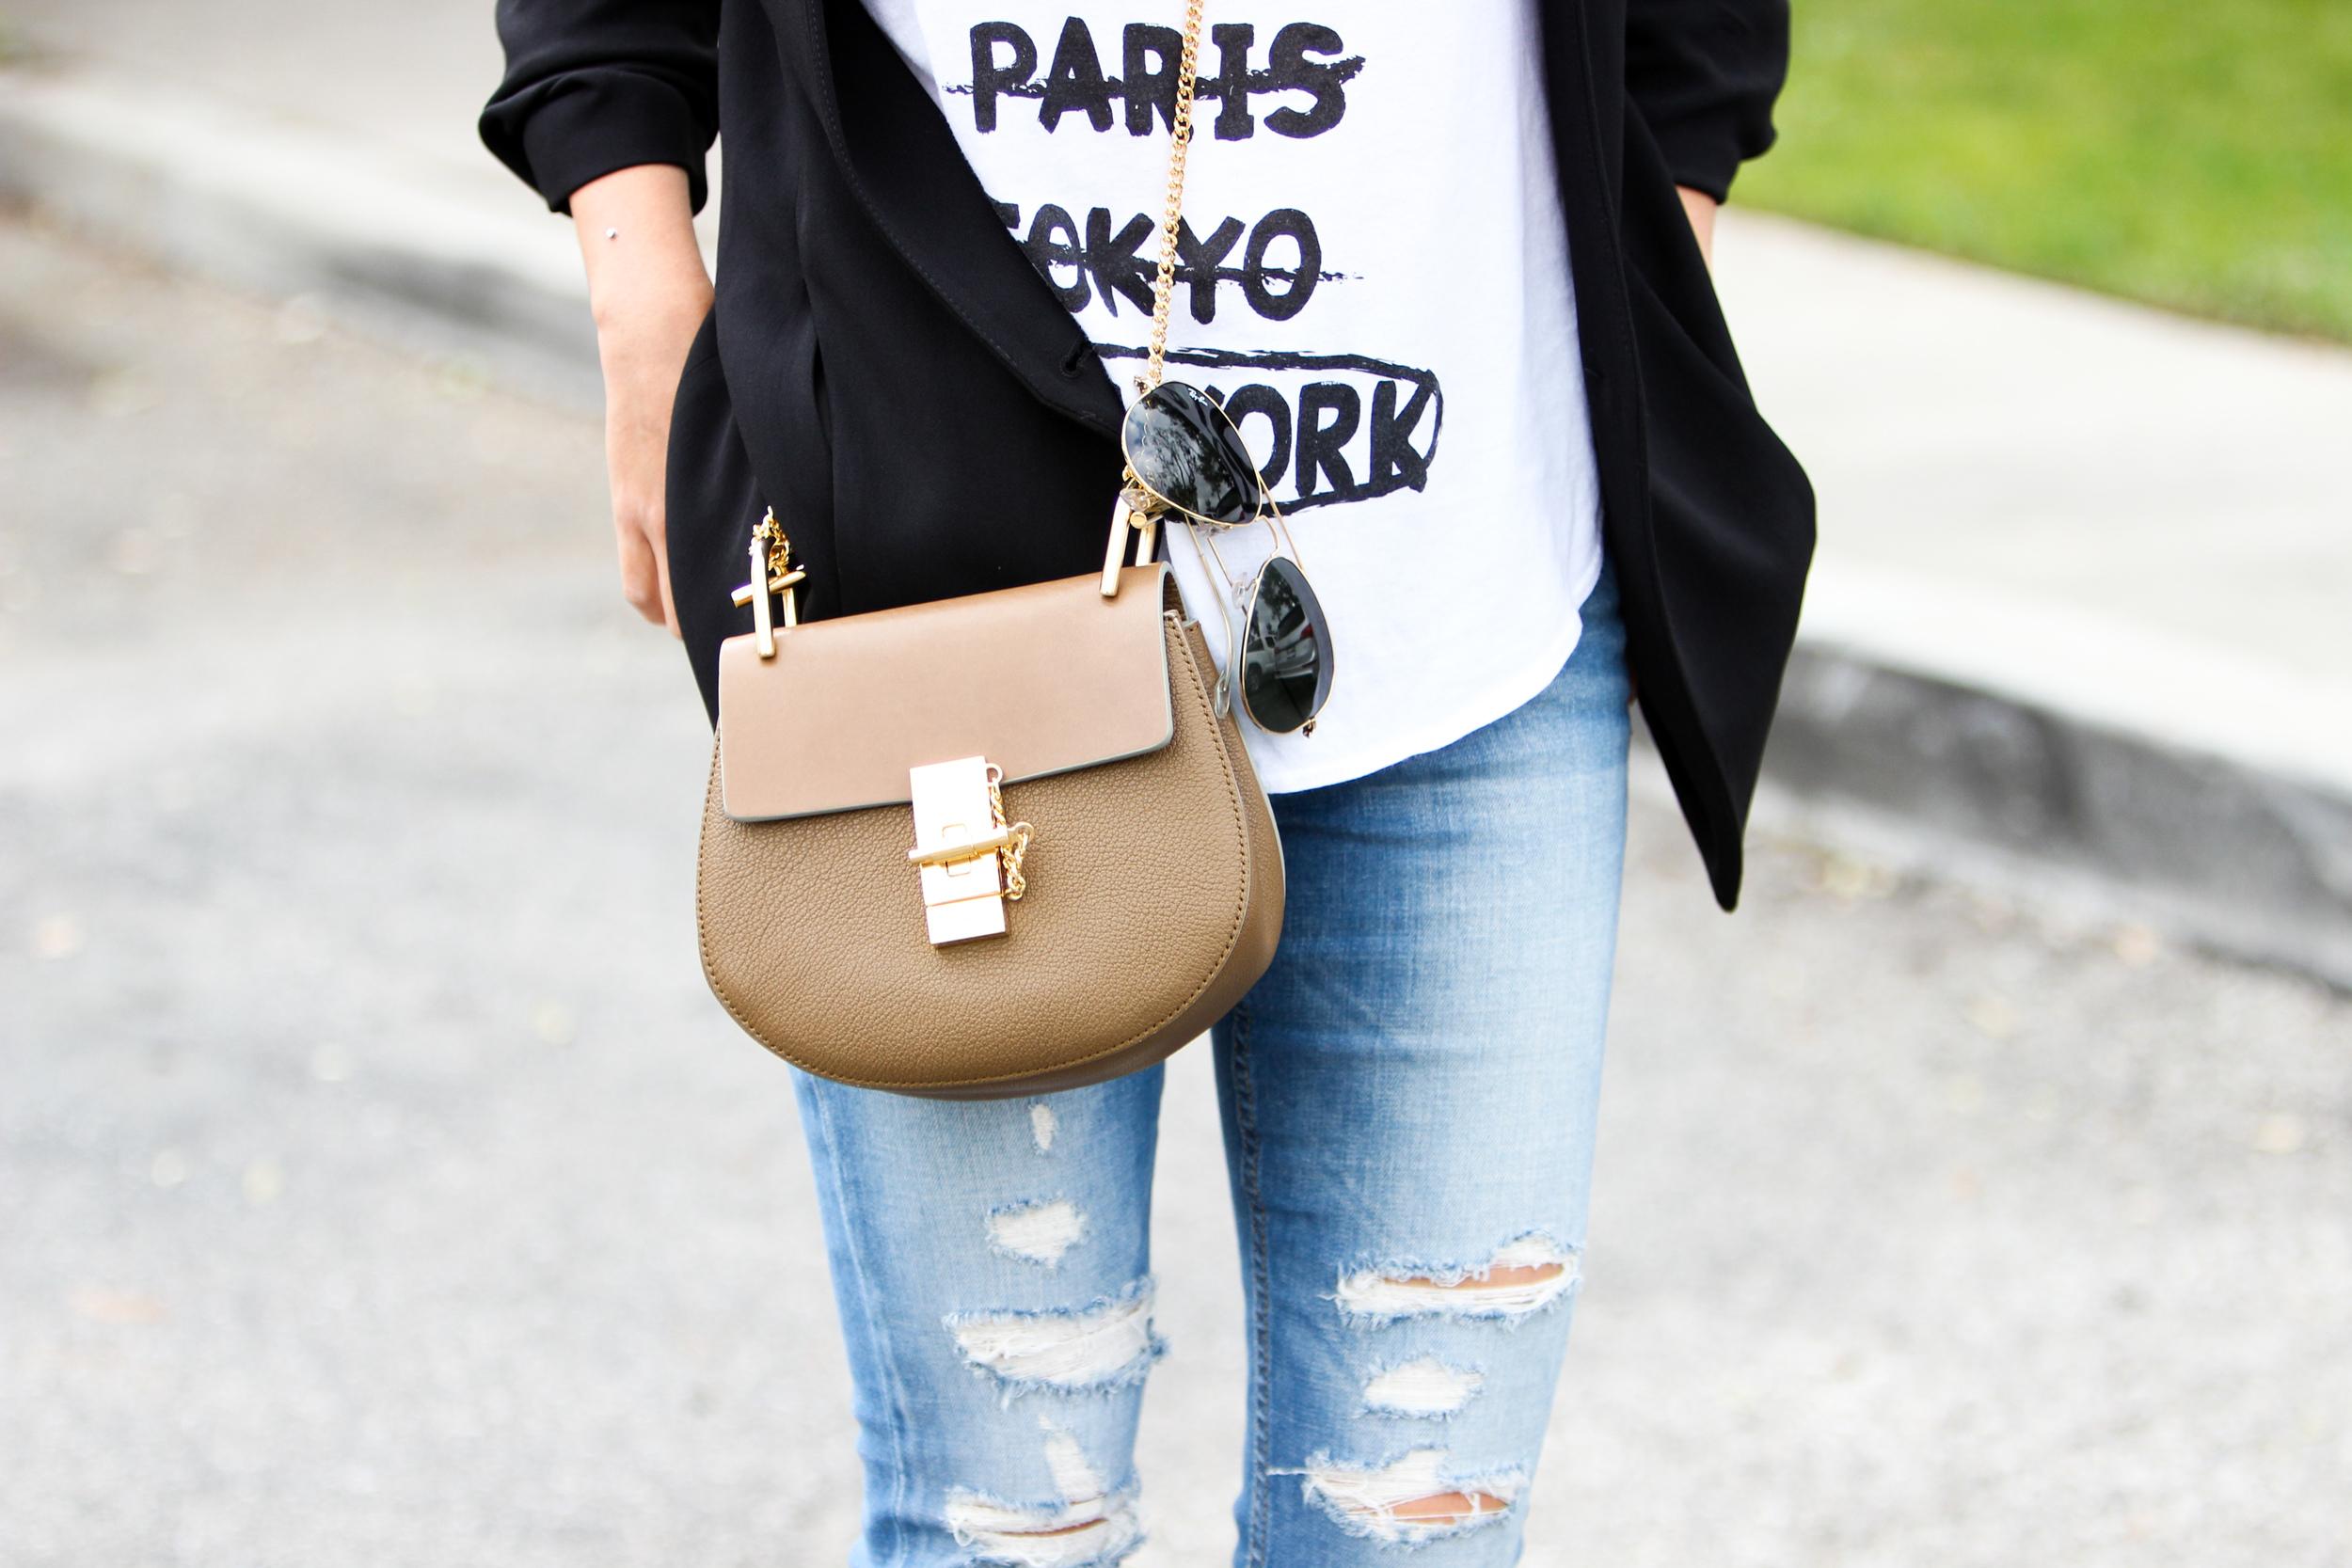 Tokyo Paris NY (8 of 8)